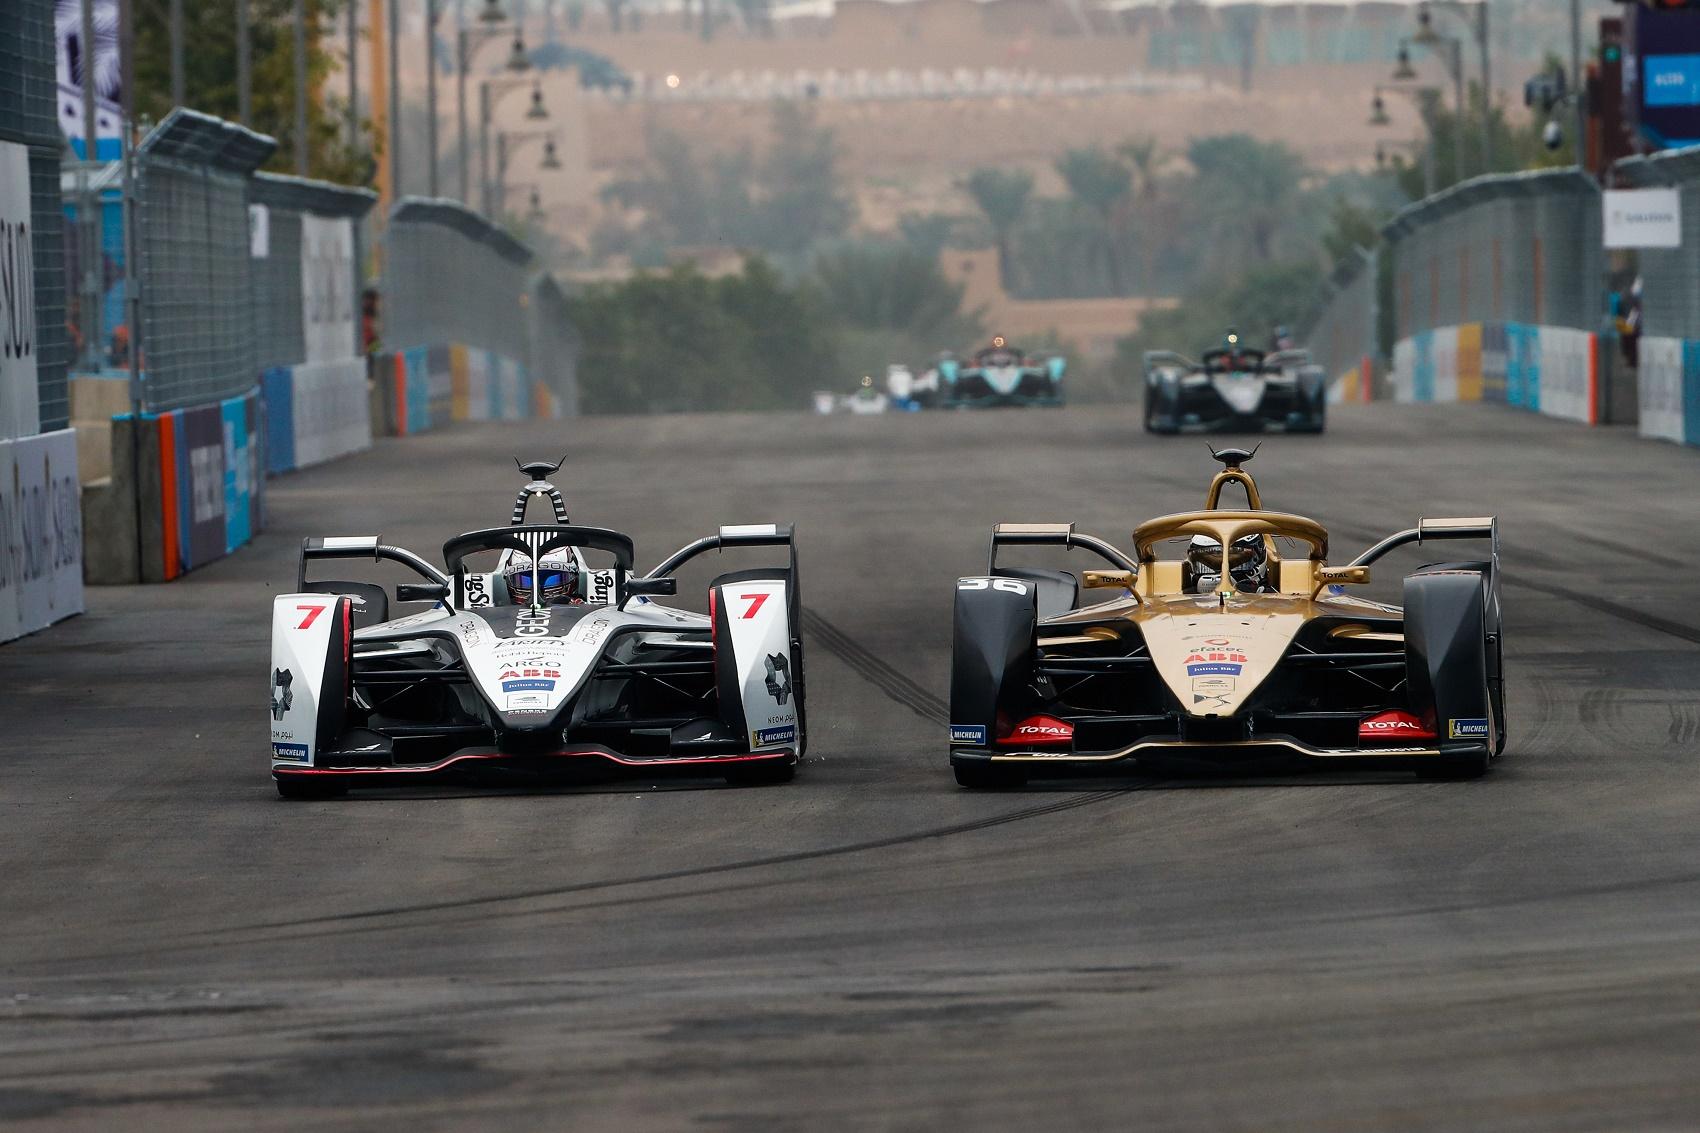 Formula E, attack mode, racingline, racingline.hu, racinglinehu